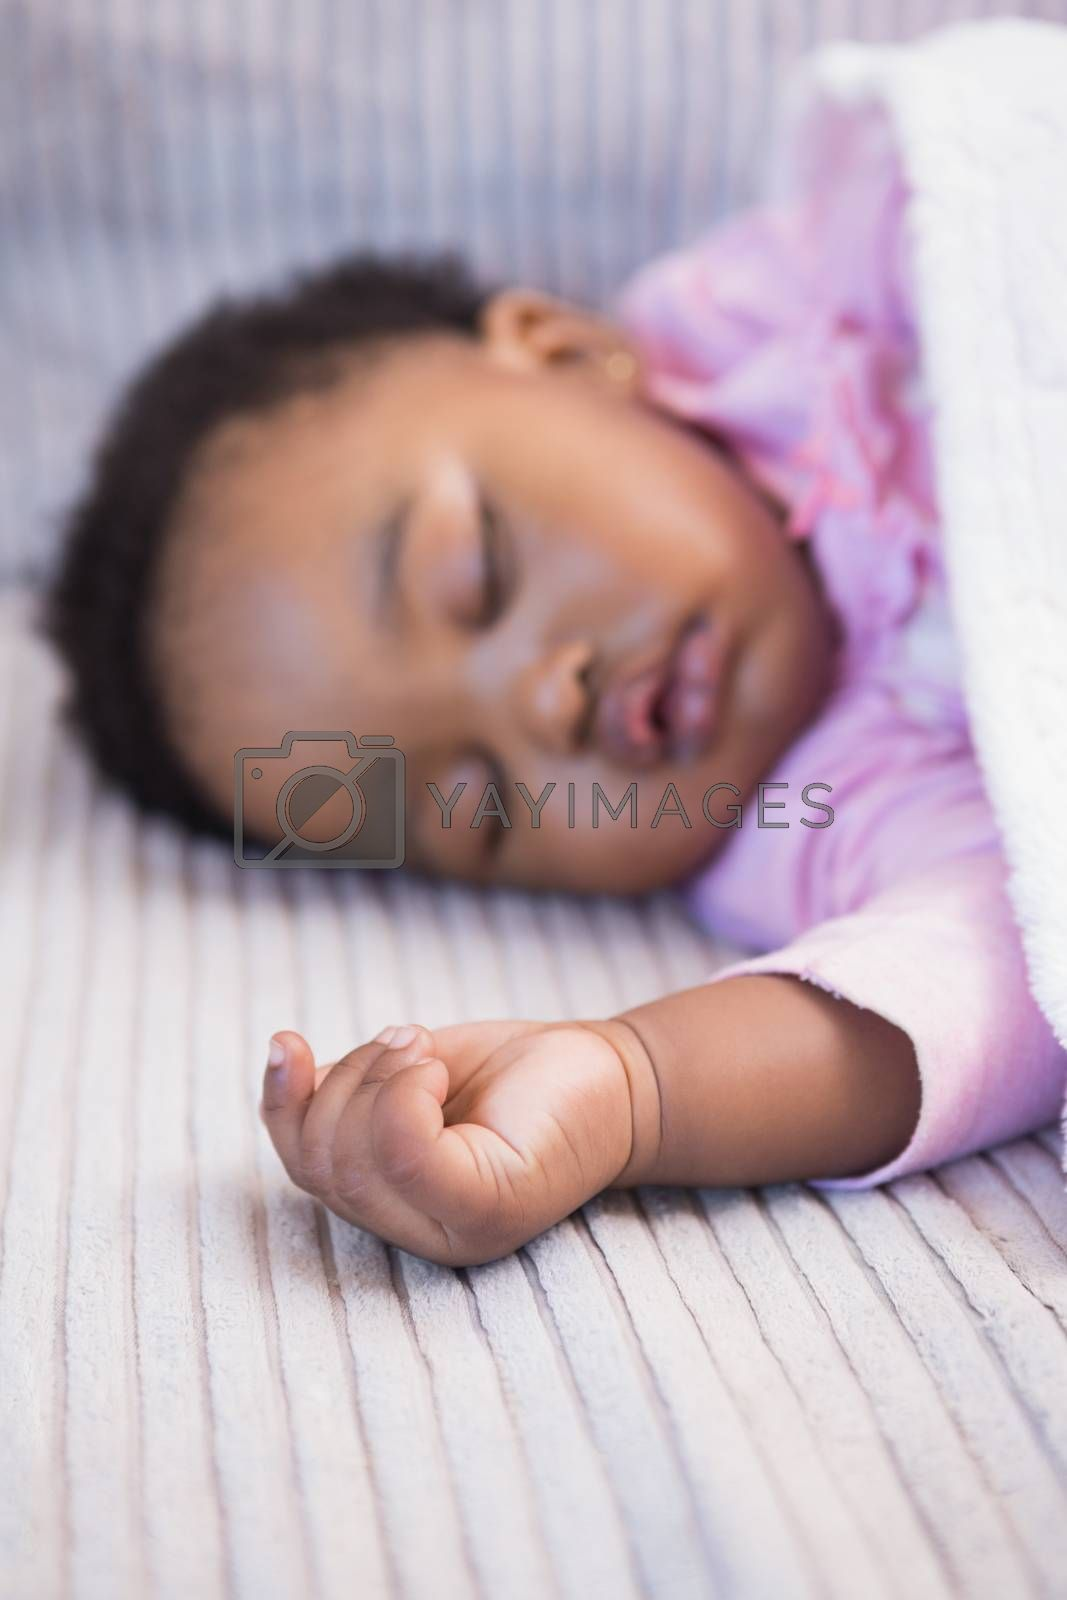 Royalty free image of Little girl sleeping on the sofa by Wavebreakmedia